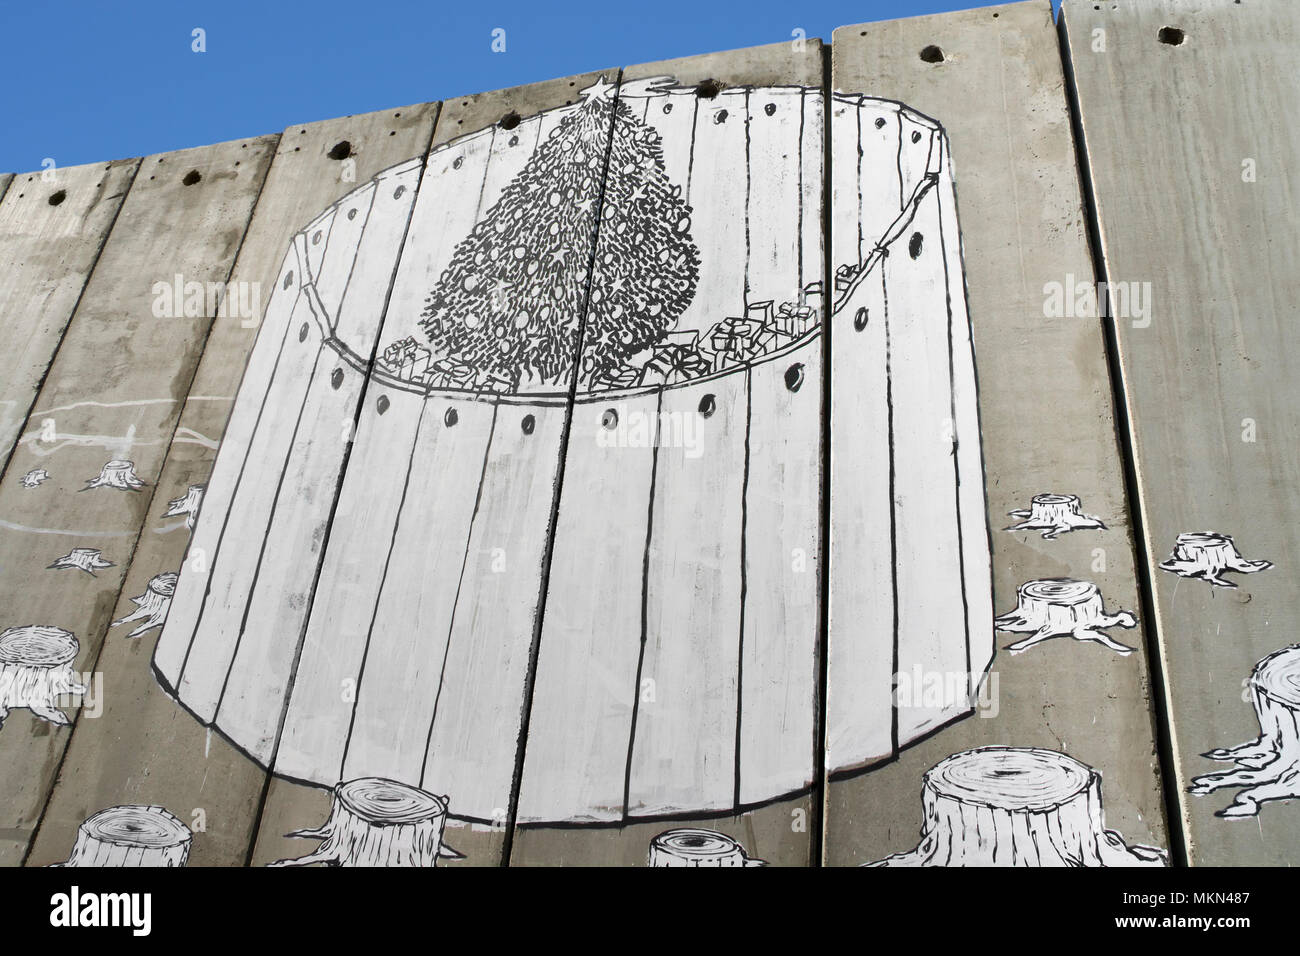 A banksy graffiti on the separation wall, Bethlehem, Palestine - Stock Image